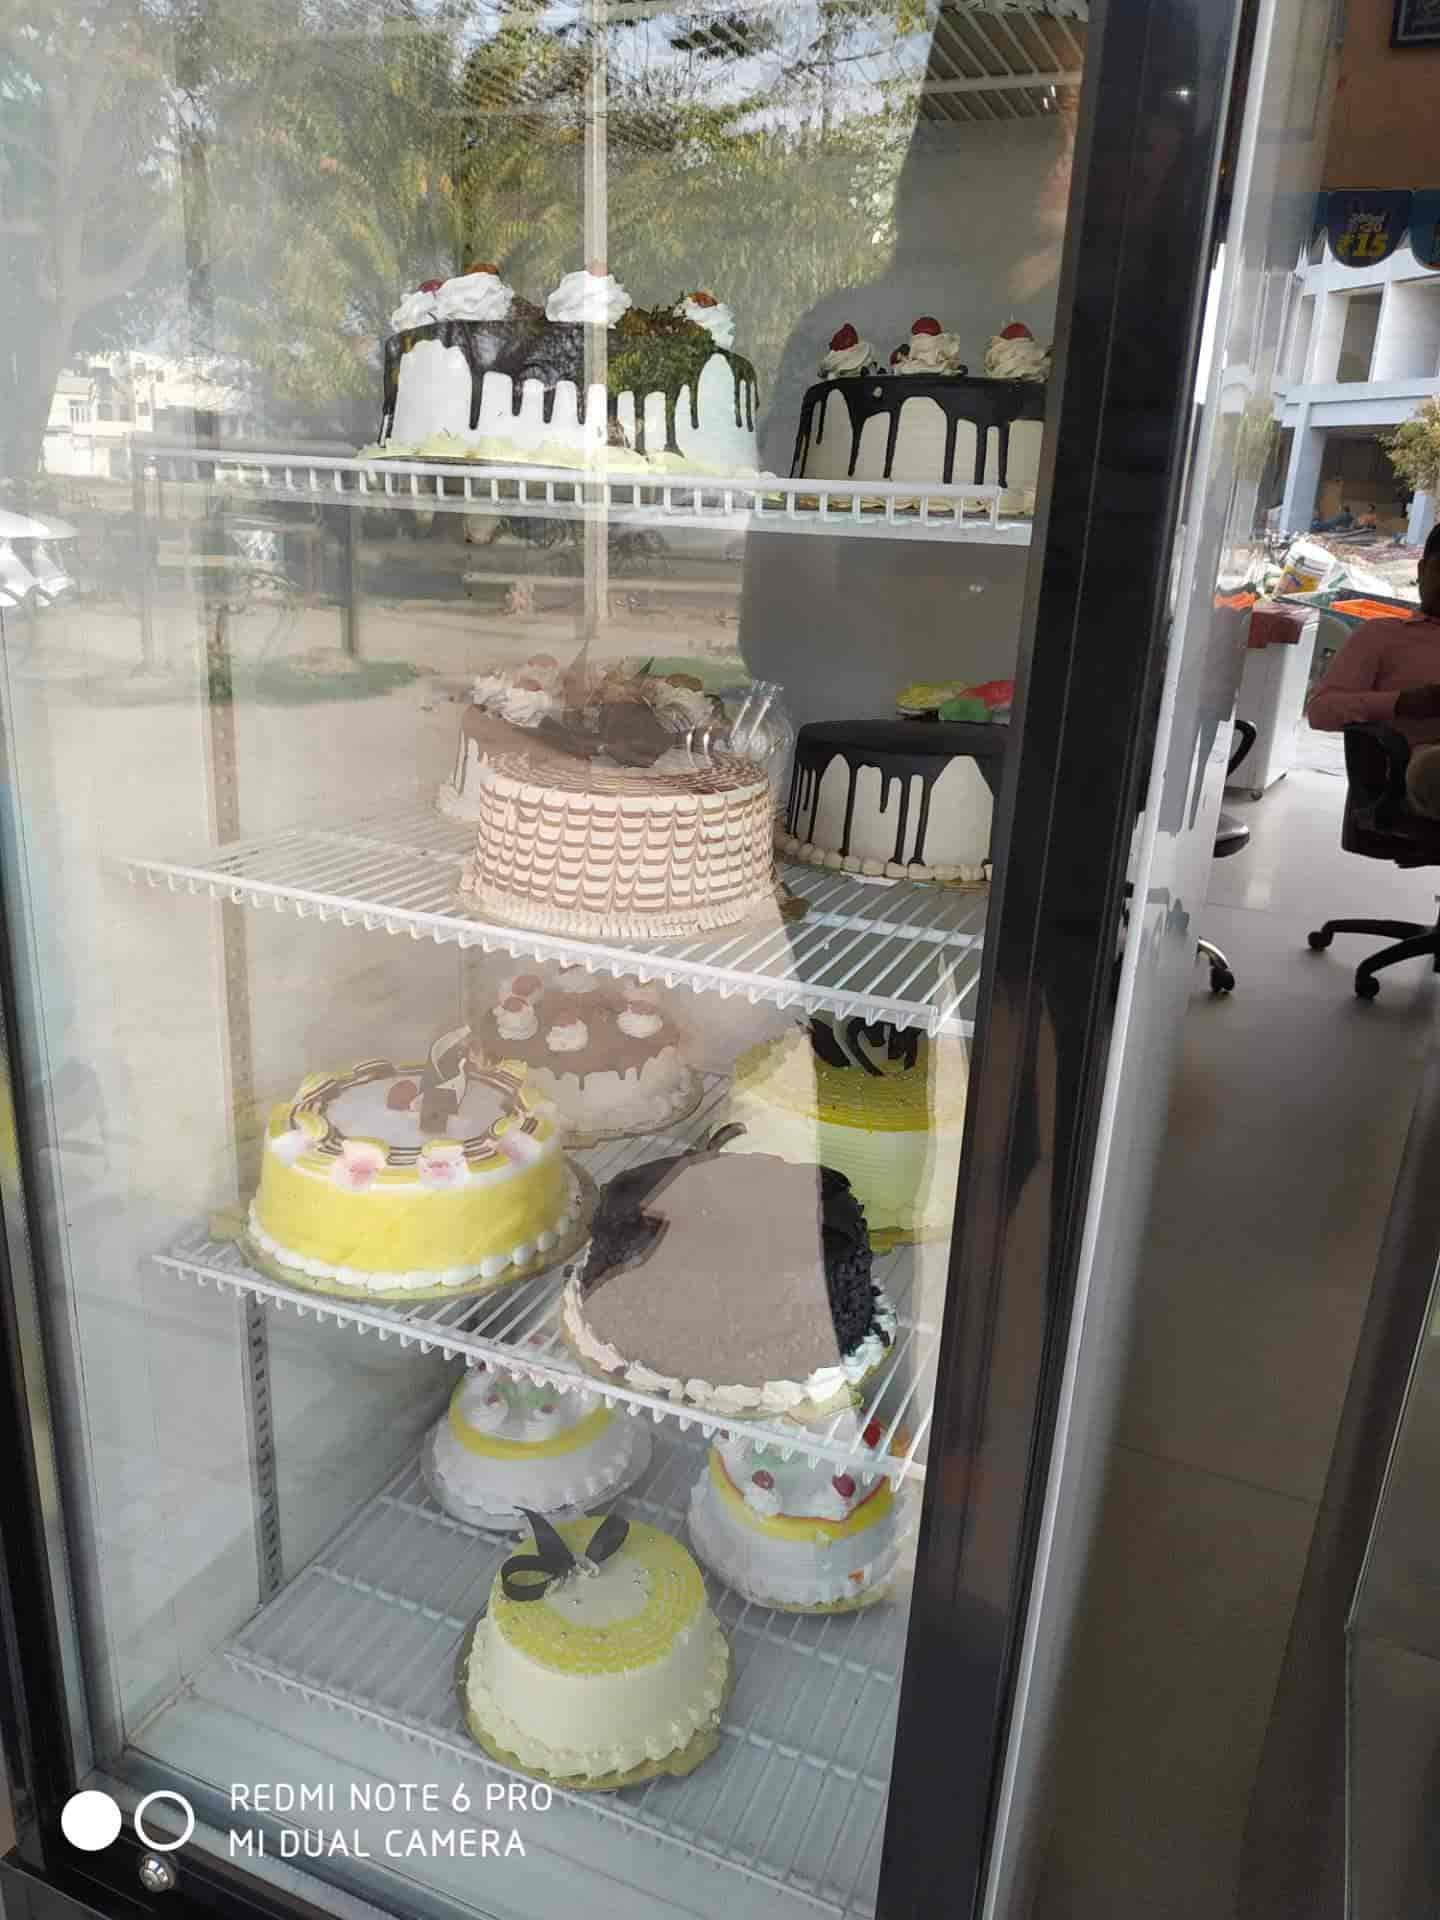 New Polka Bakery, Mohali, Chandigarh - Bakeries - Justdial